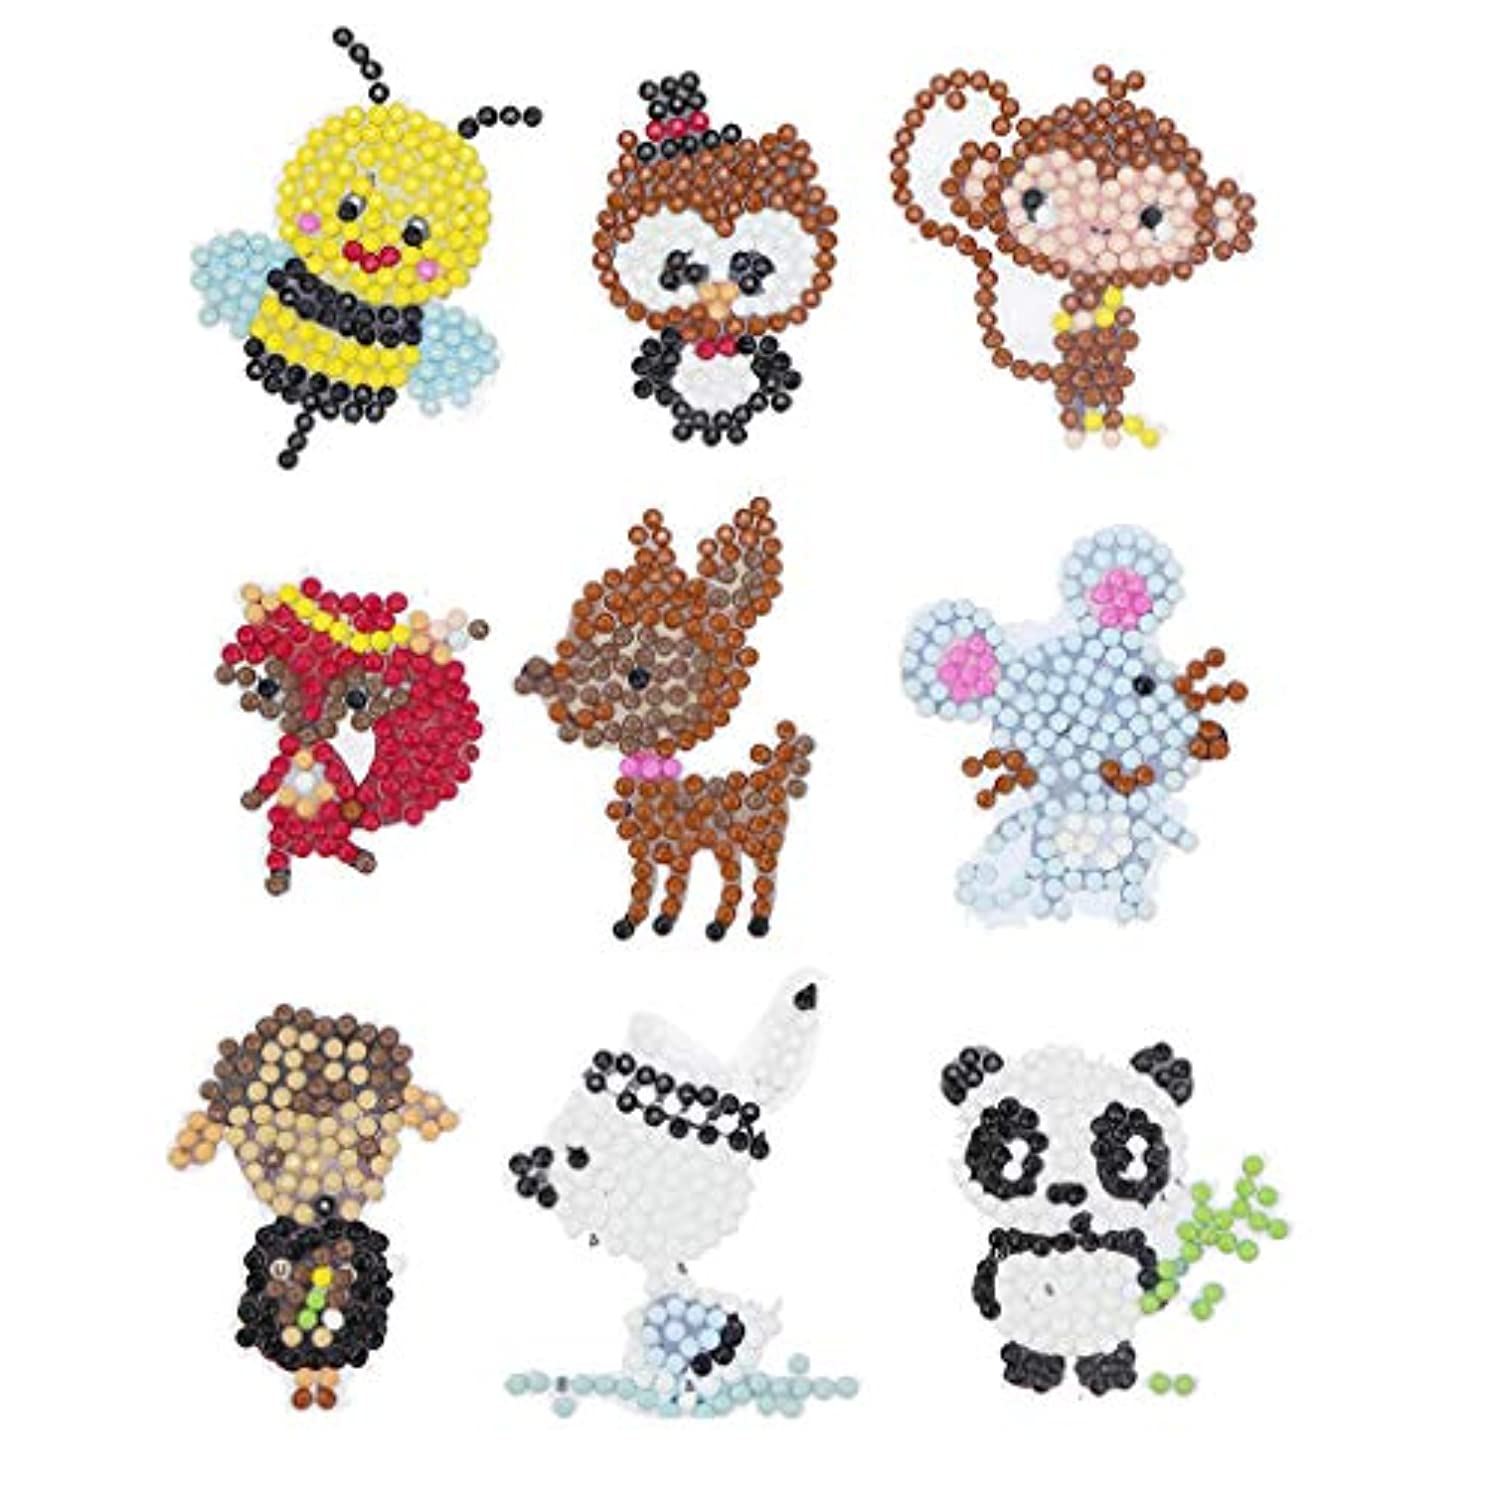 Homokea 5D DIY Diamond Dotz for Kids Full Drill Diamond Painting Pictures Diamond Art Kits (Small Animals)